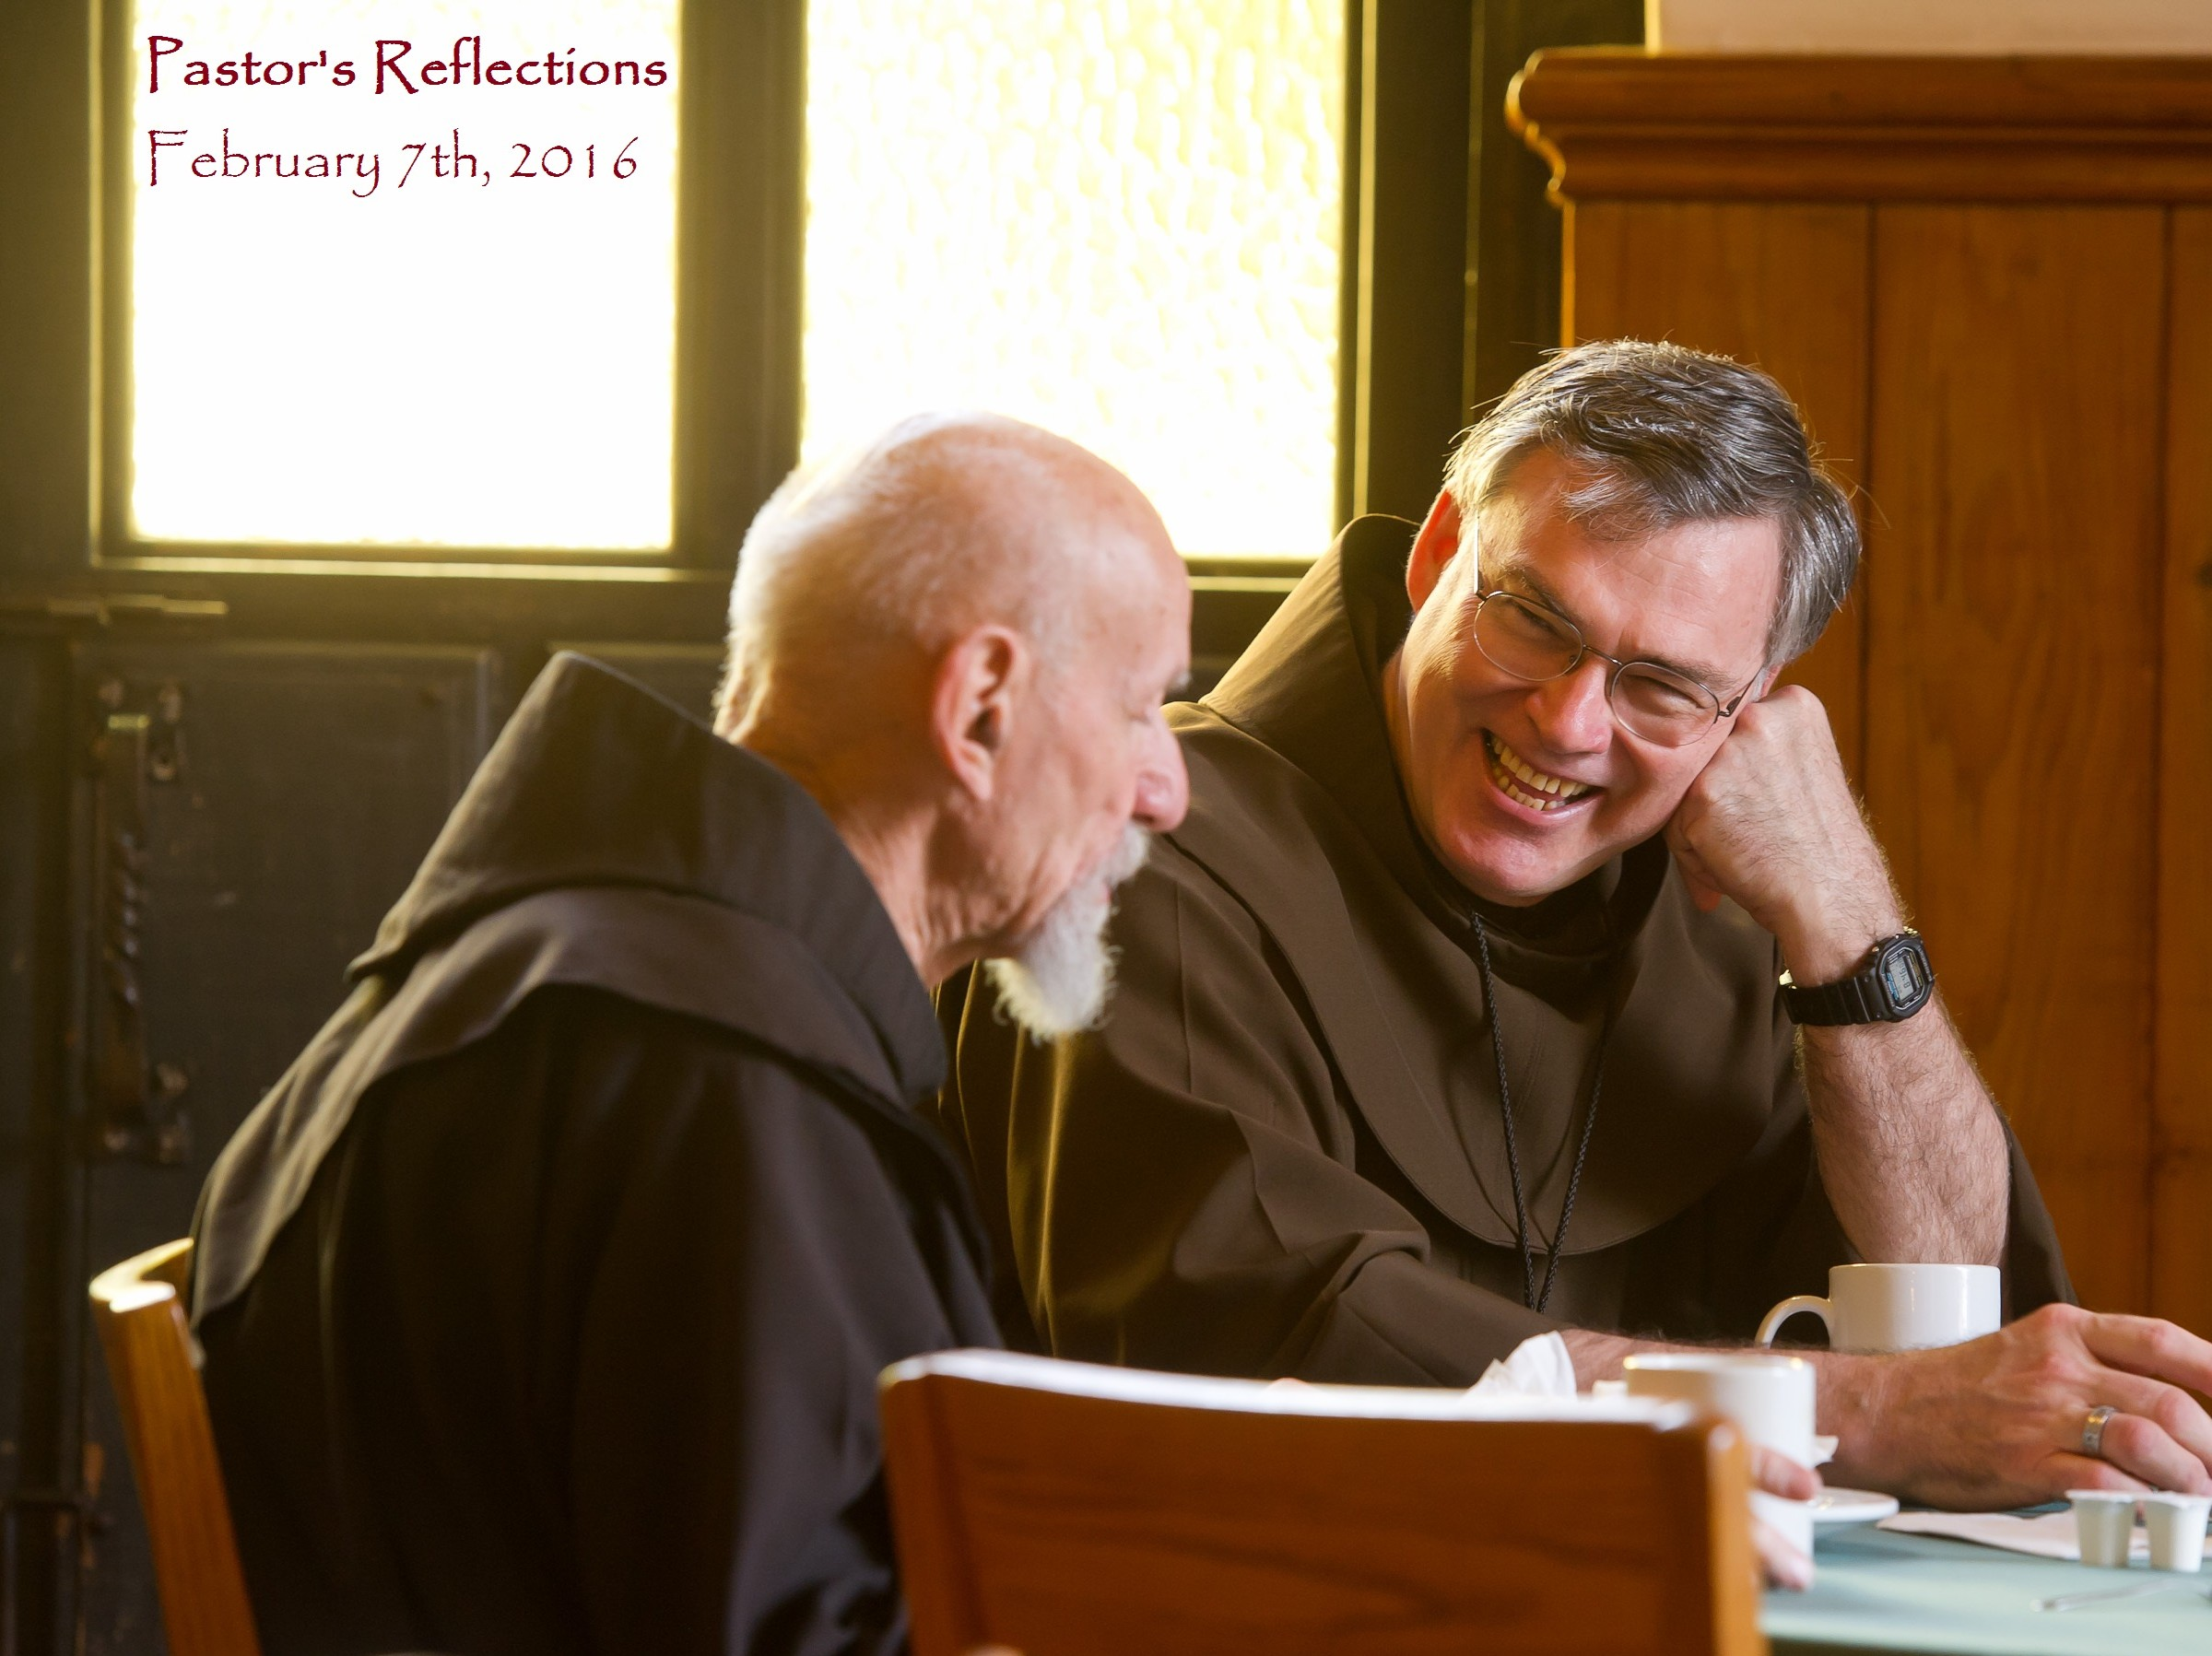 Pastors Reflections